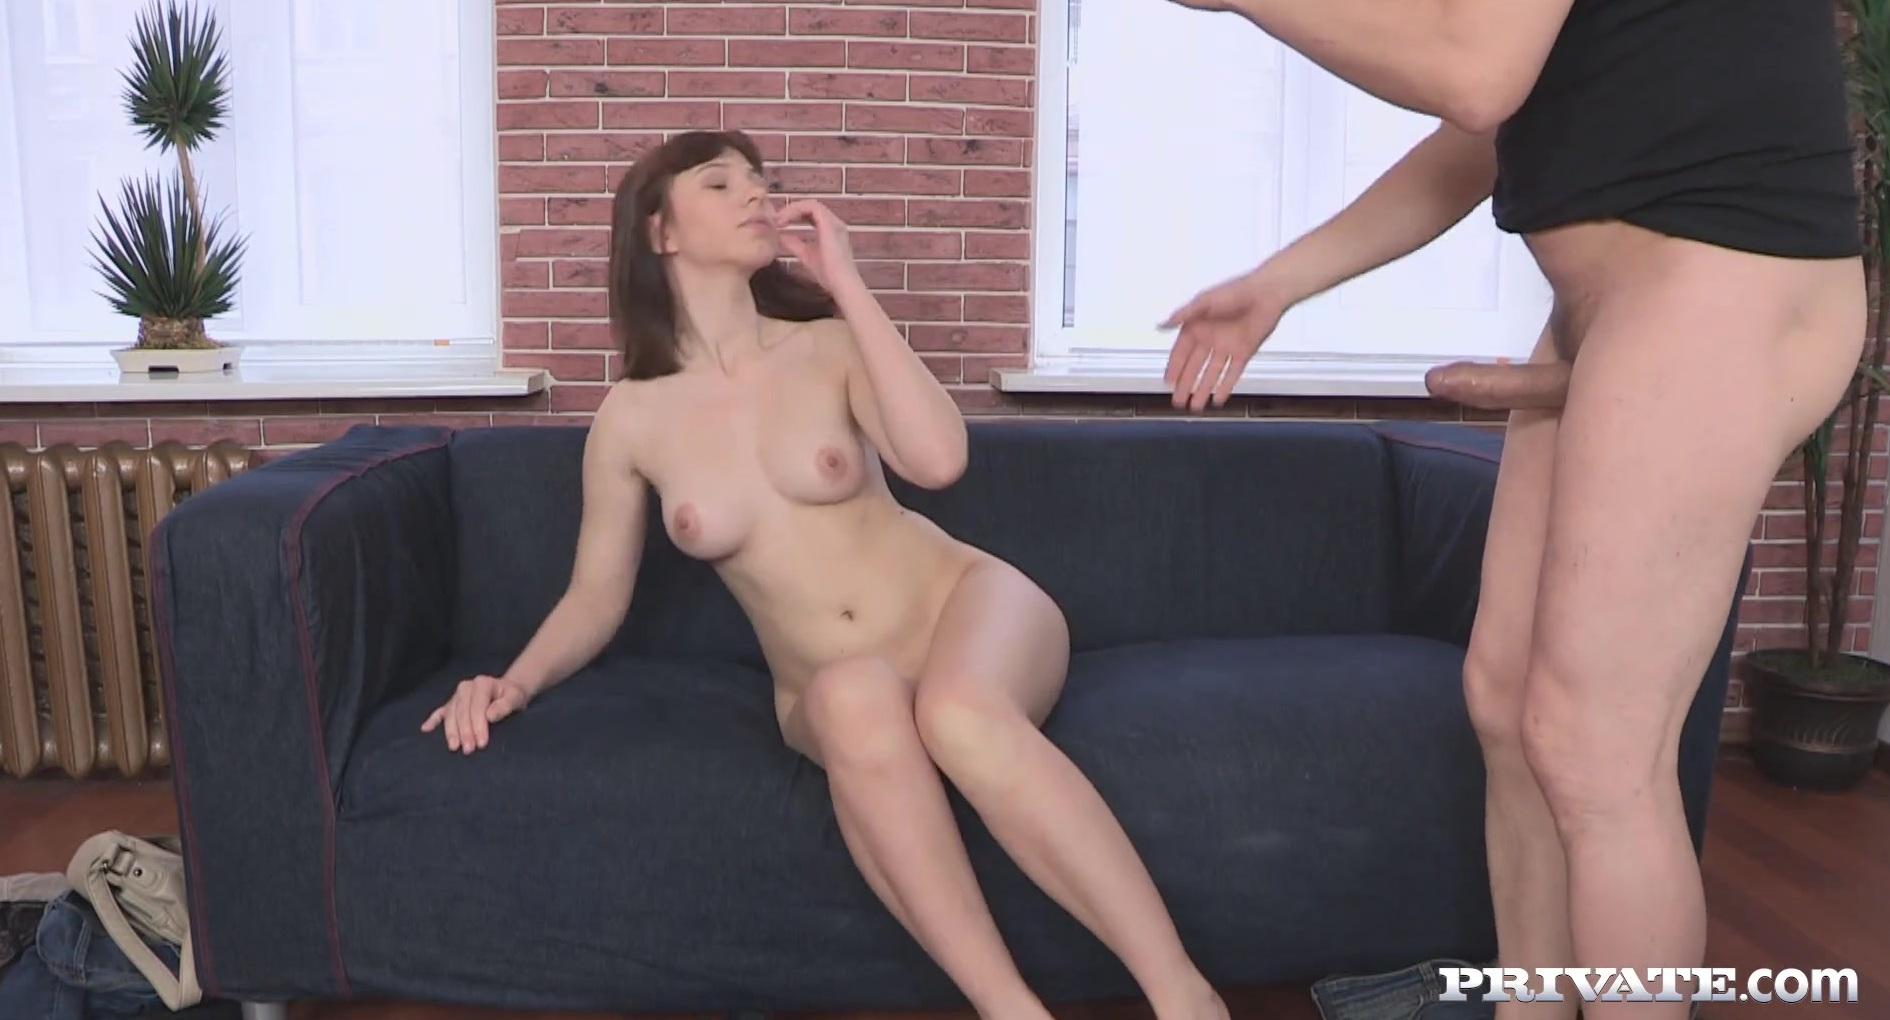 Снял девку на улице для порно кастинга